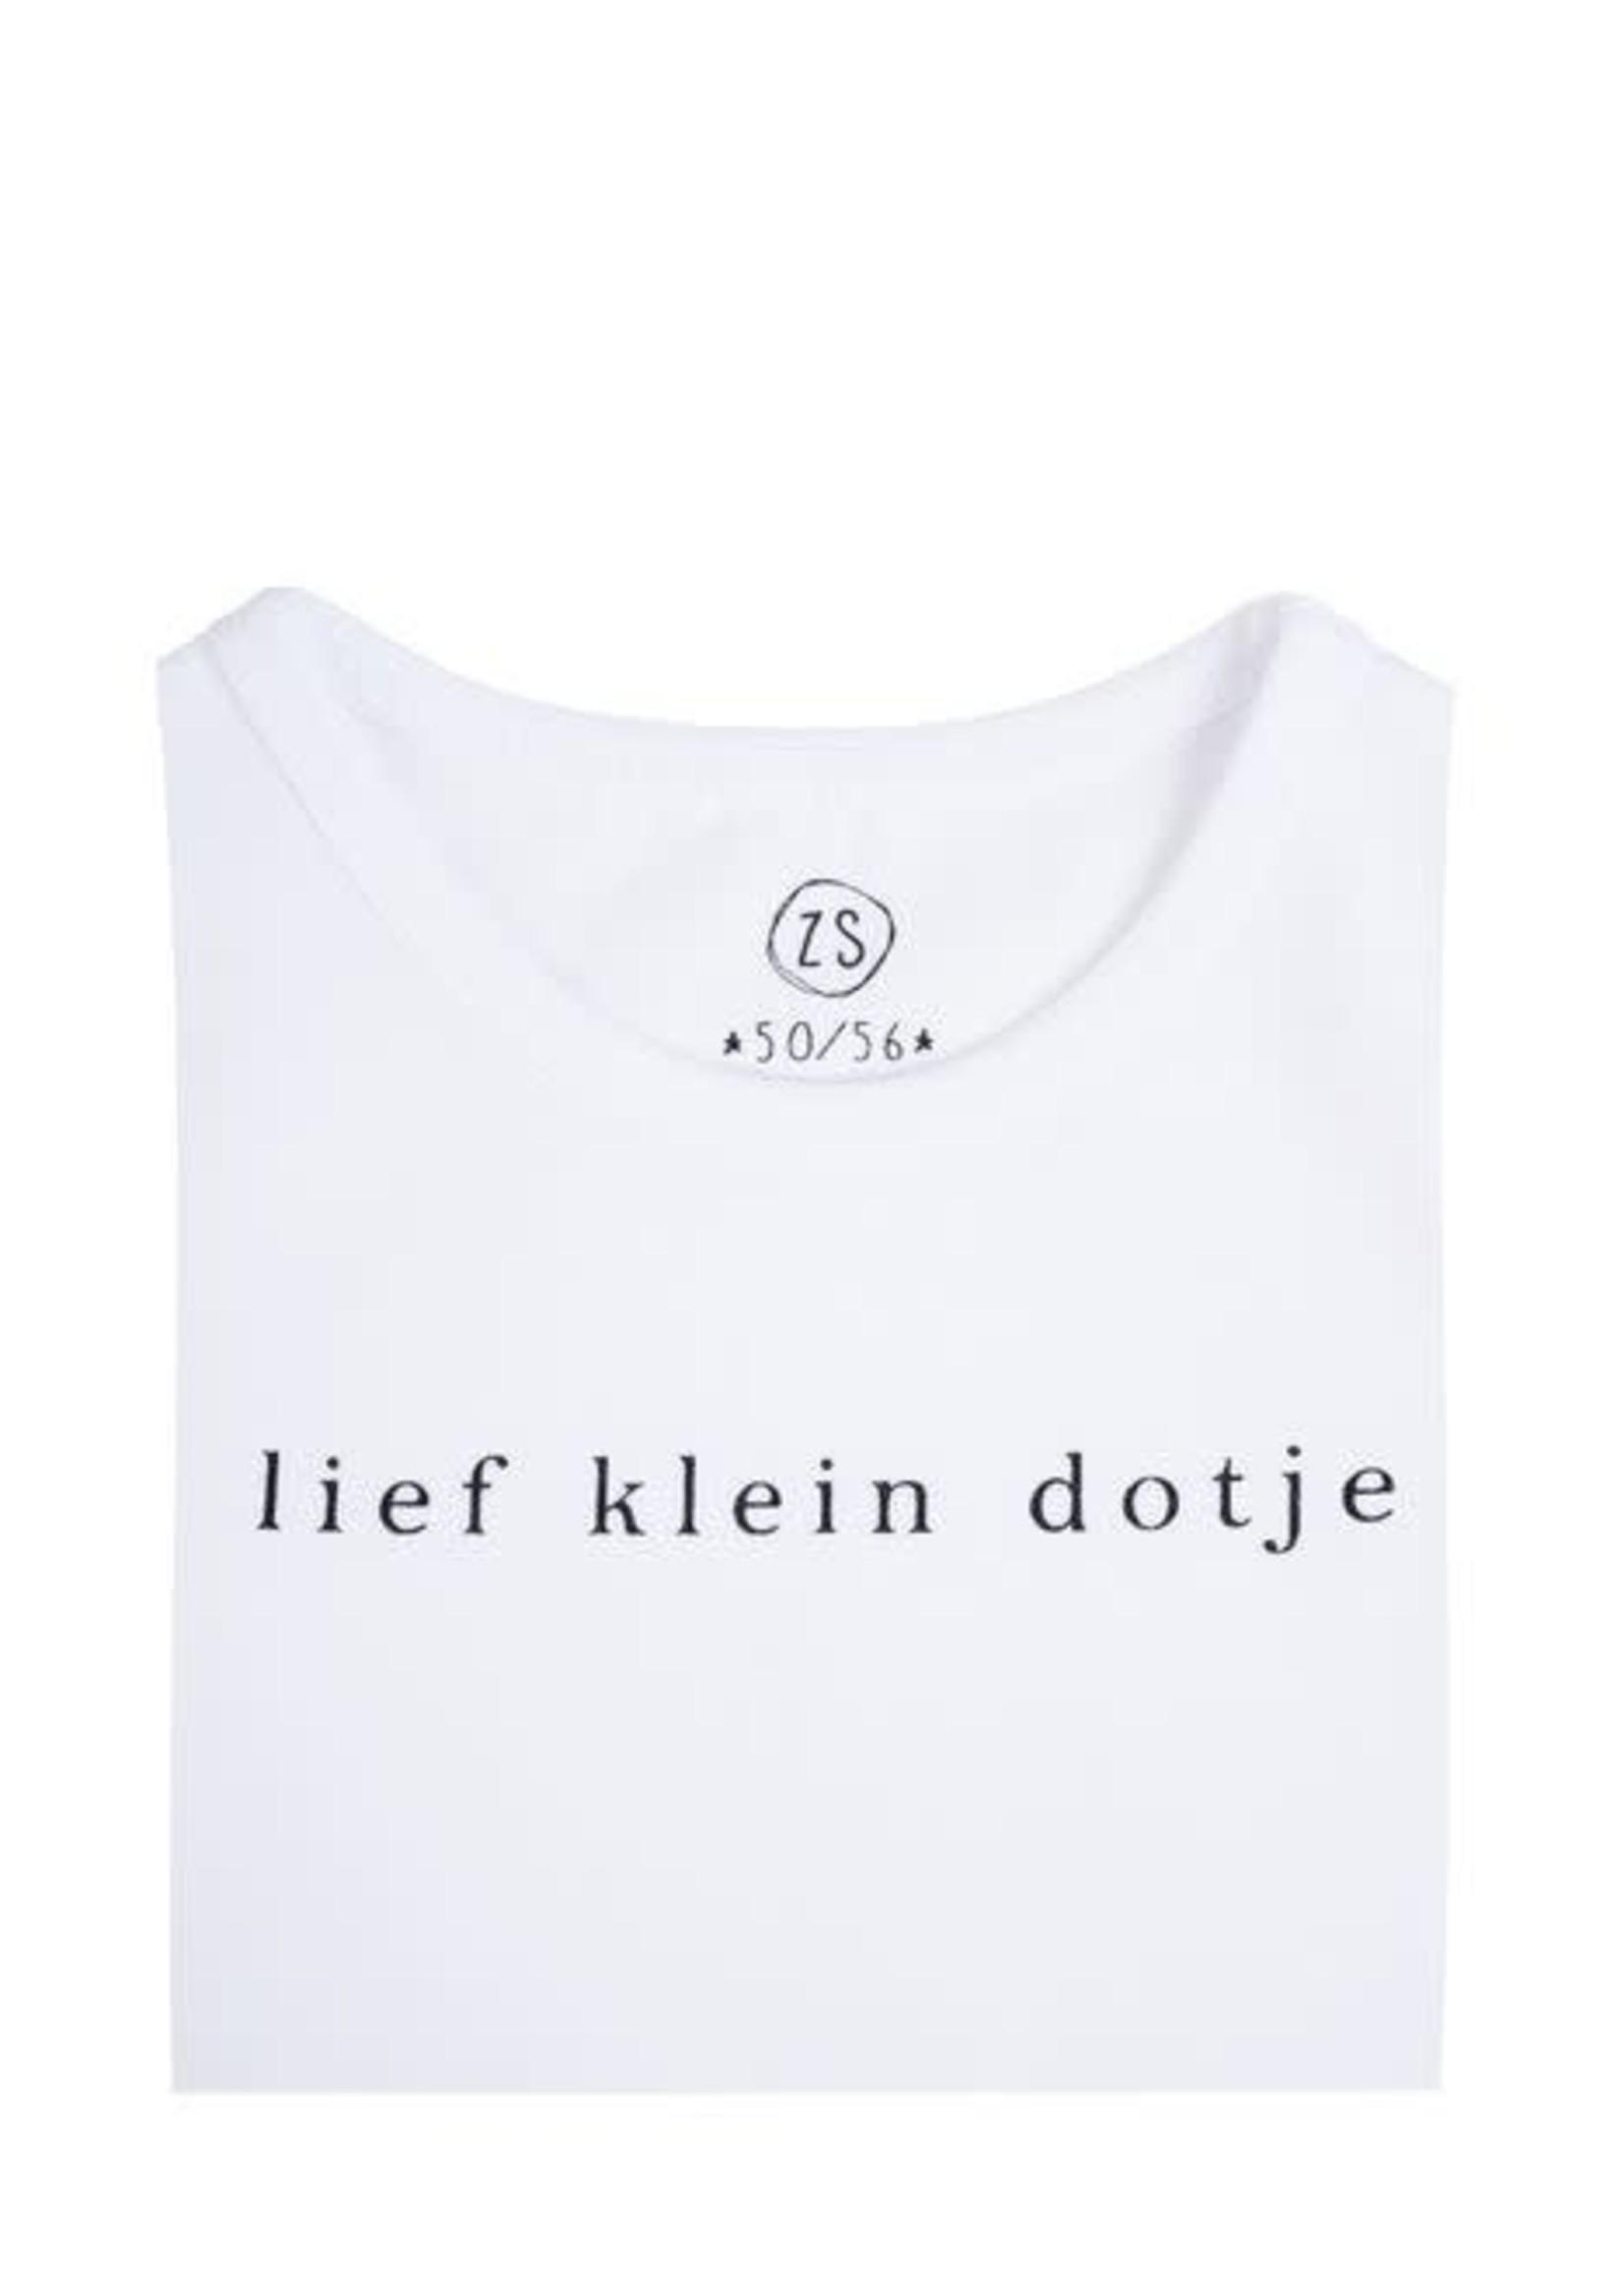 ZUSSS Rompertje  Klein dotje  maat 62/68